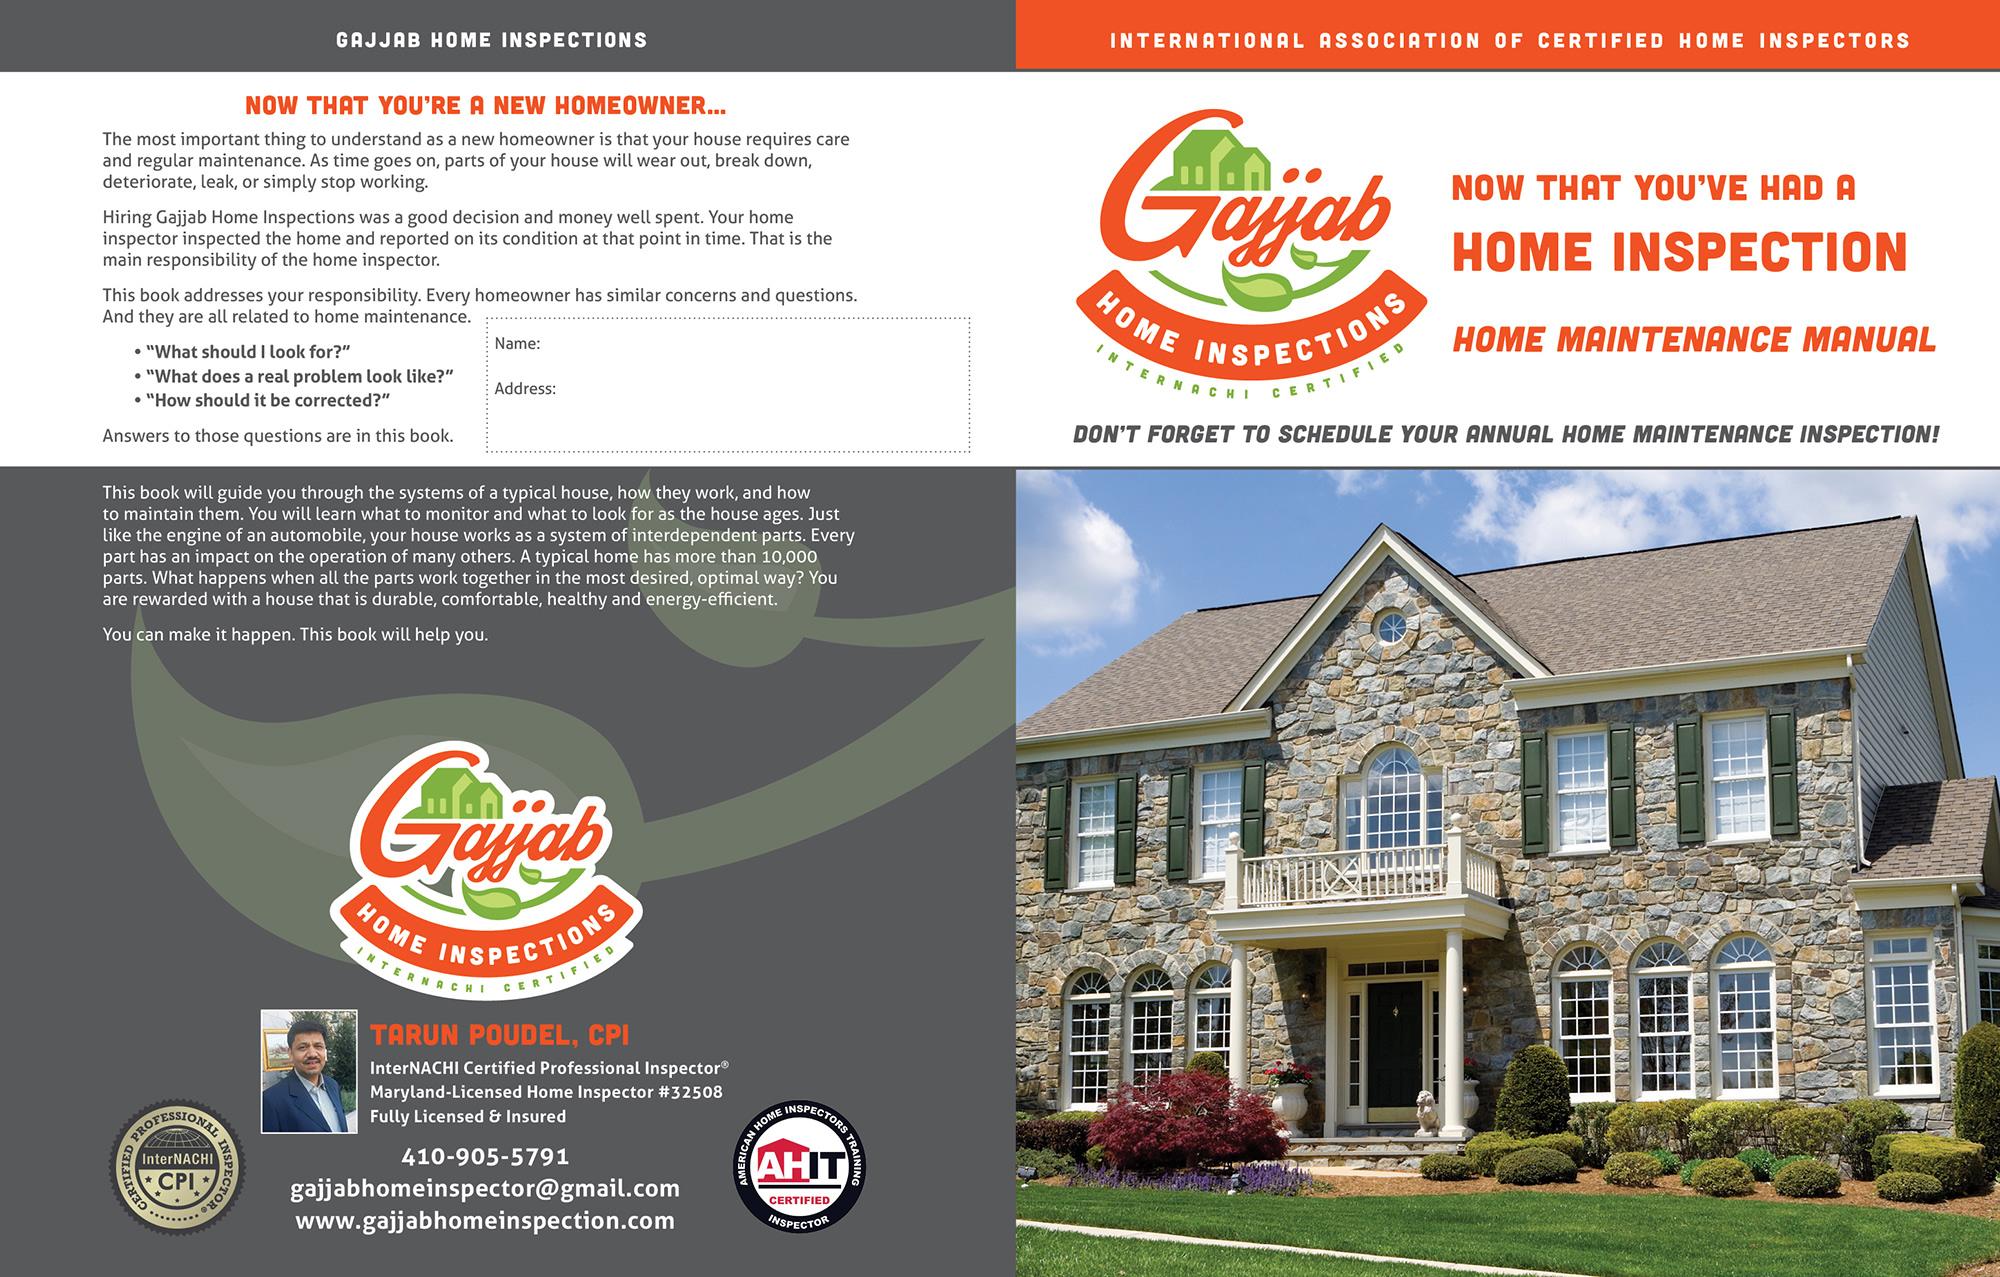 Custom Home Maintenance Book for Gajjab Home Inspections.